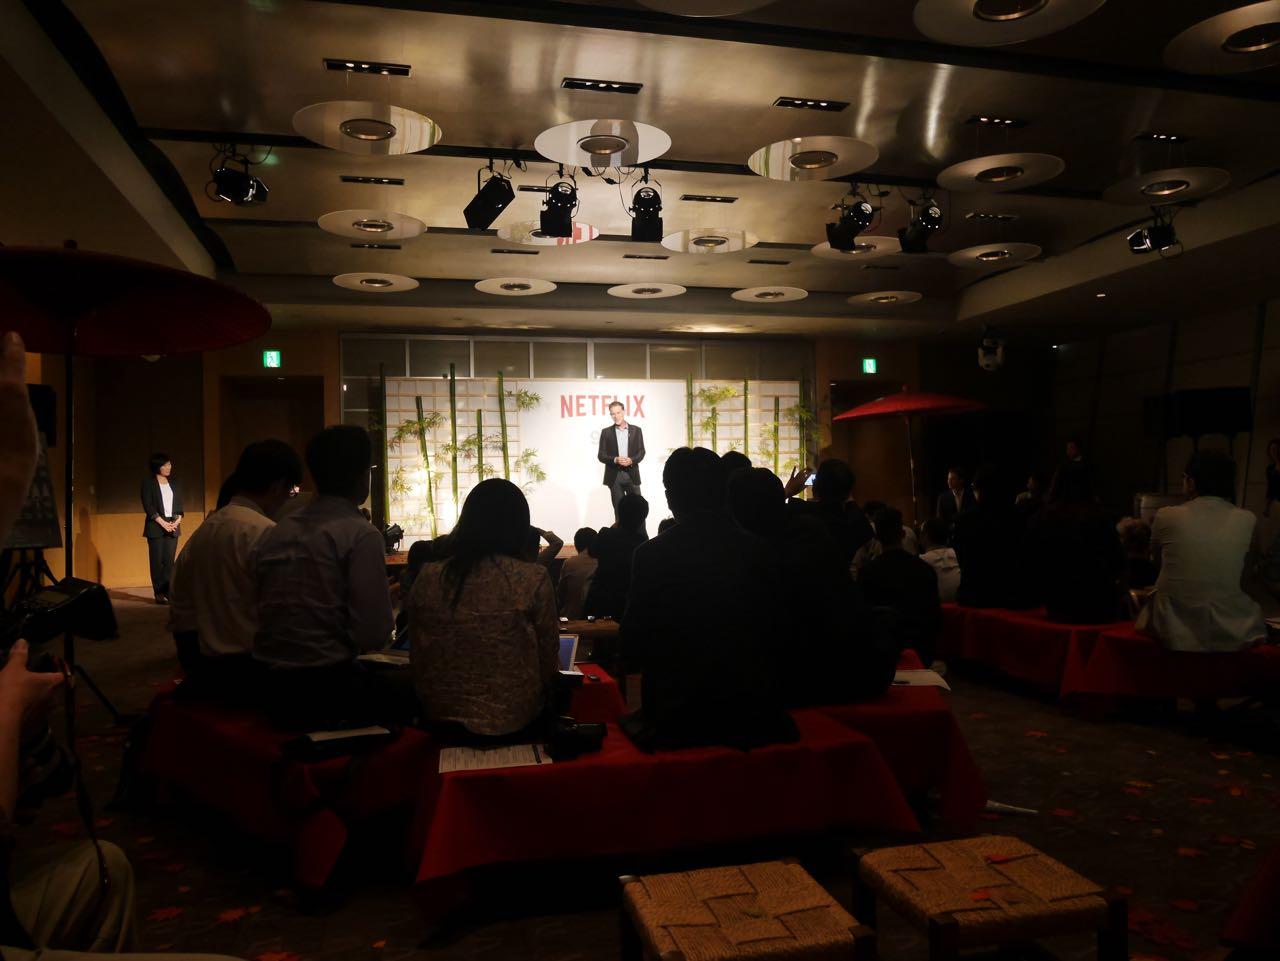 Netflixは日本で成功する。その確信を得たスタート〜ローンチウィークを追う〜